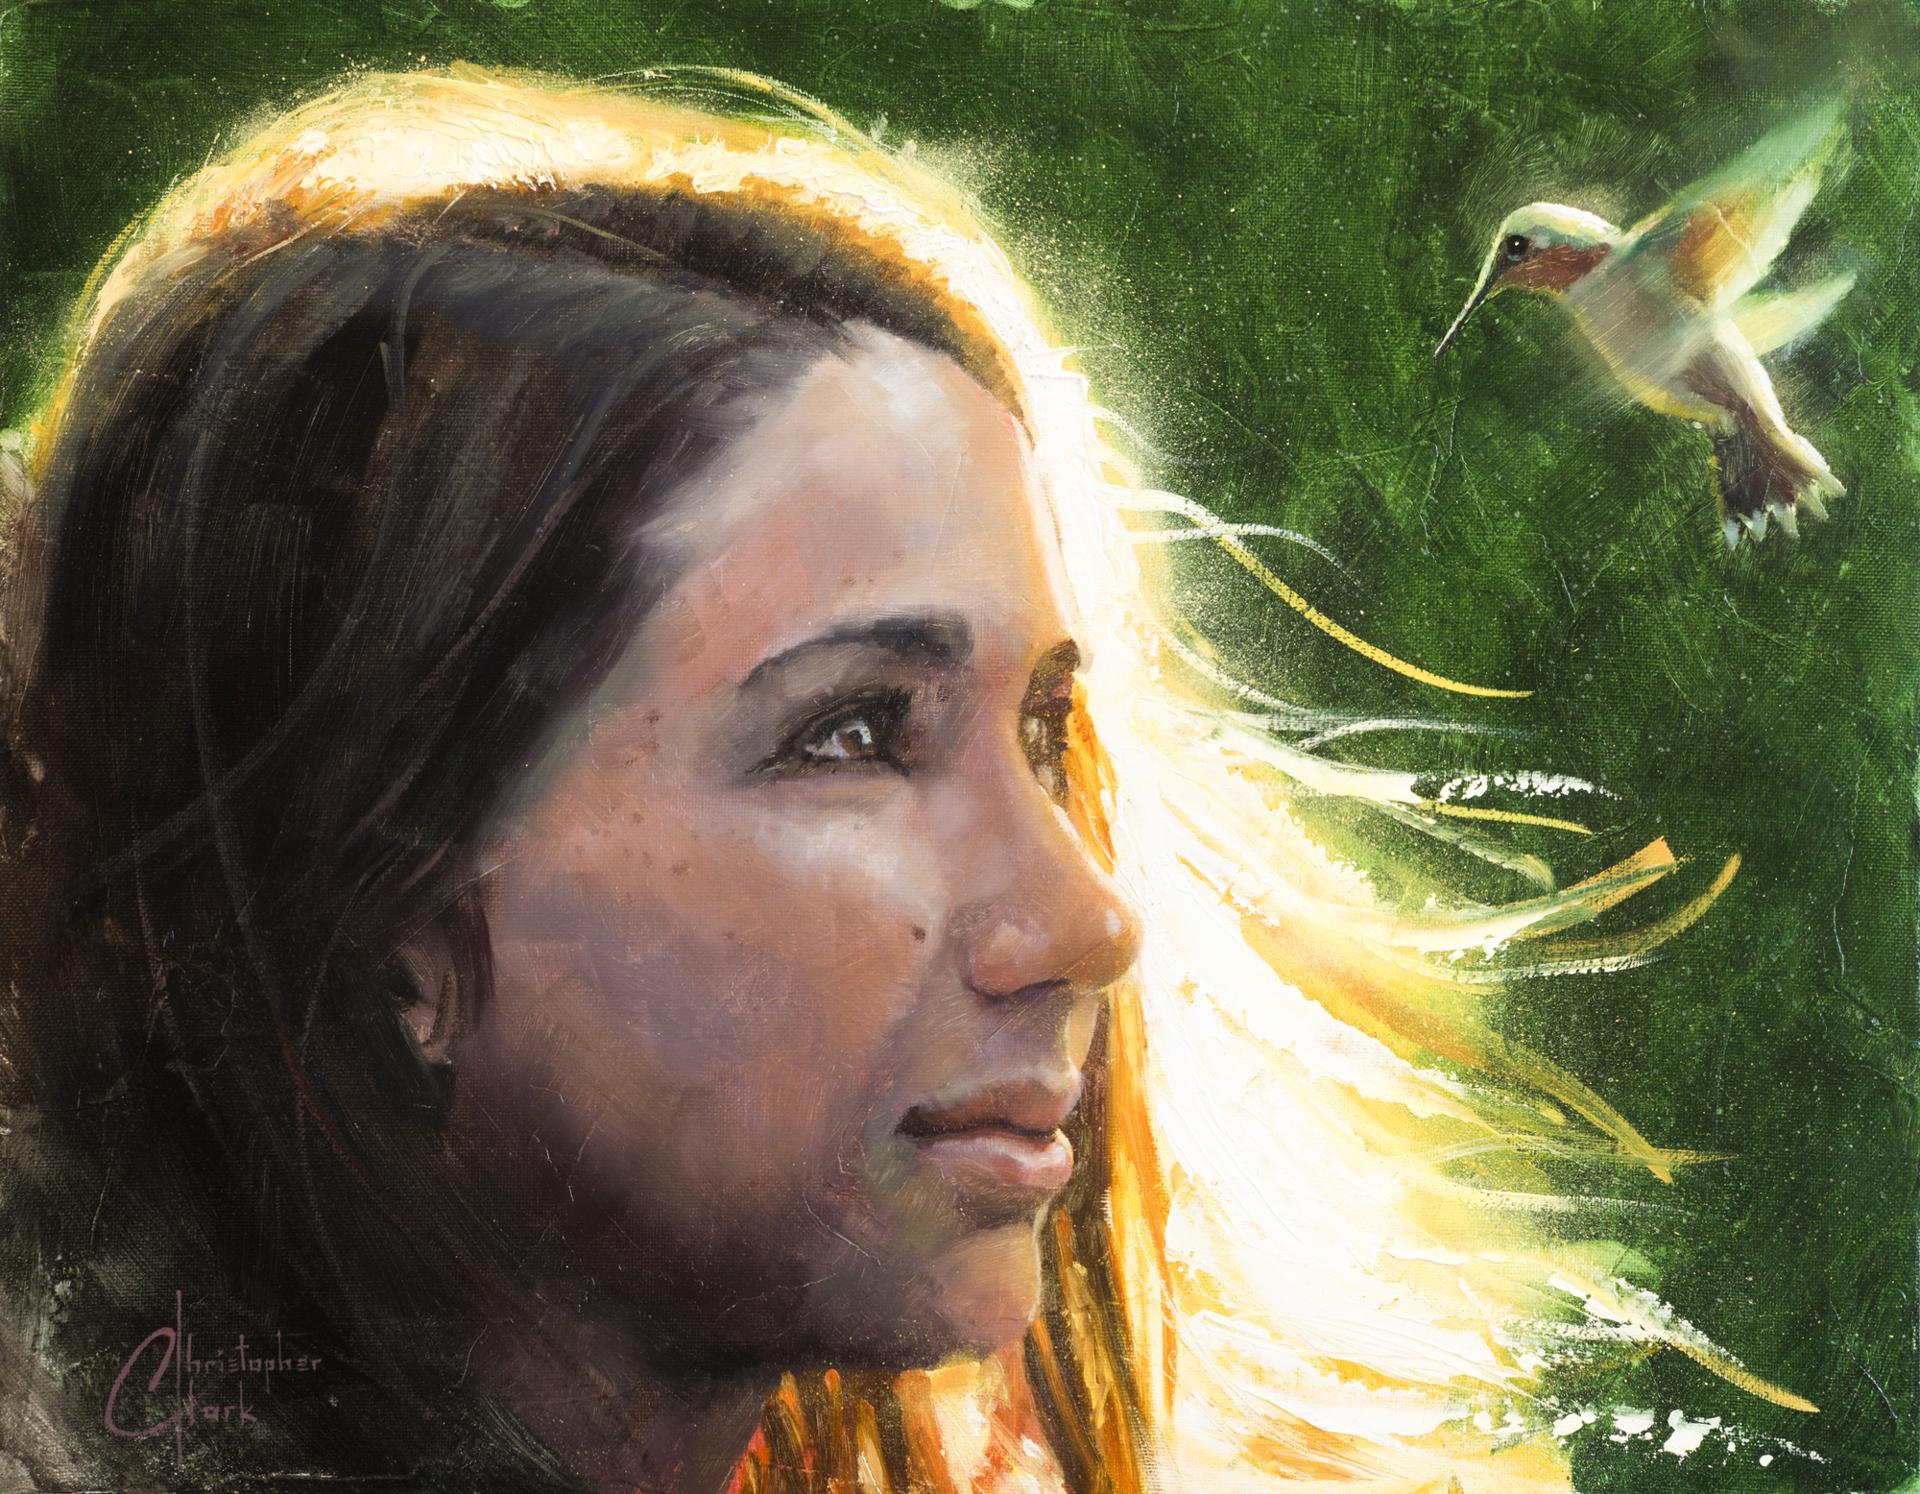 Bird Watching by Christopher Clark